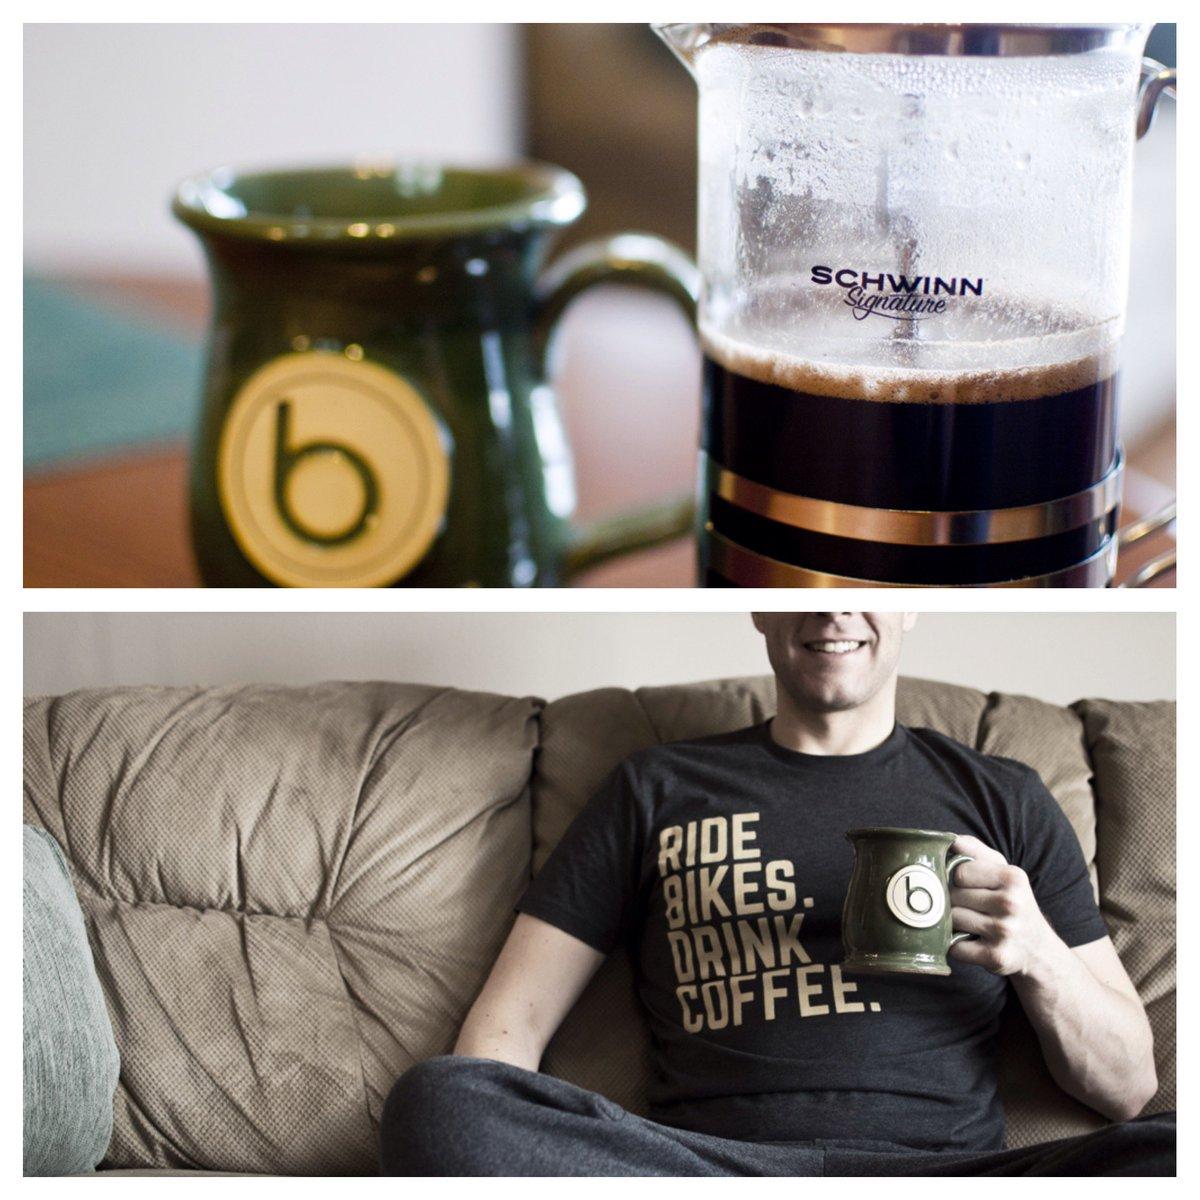 Love Schwinn? Love Coffee? Follow us to enter to win this Schwinn coffee press and Schwinn T-shirt.  Ends June 1st. https://t.co/Ewhjs3XM4b